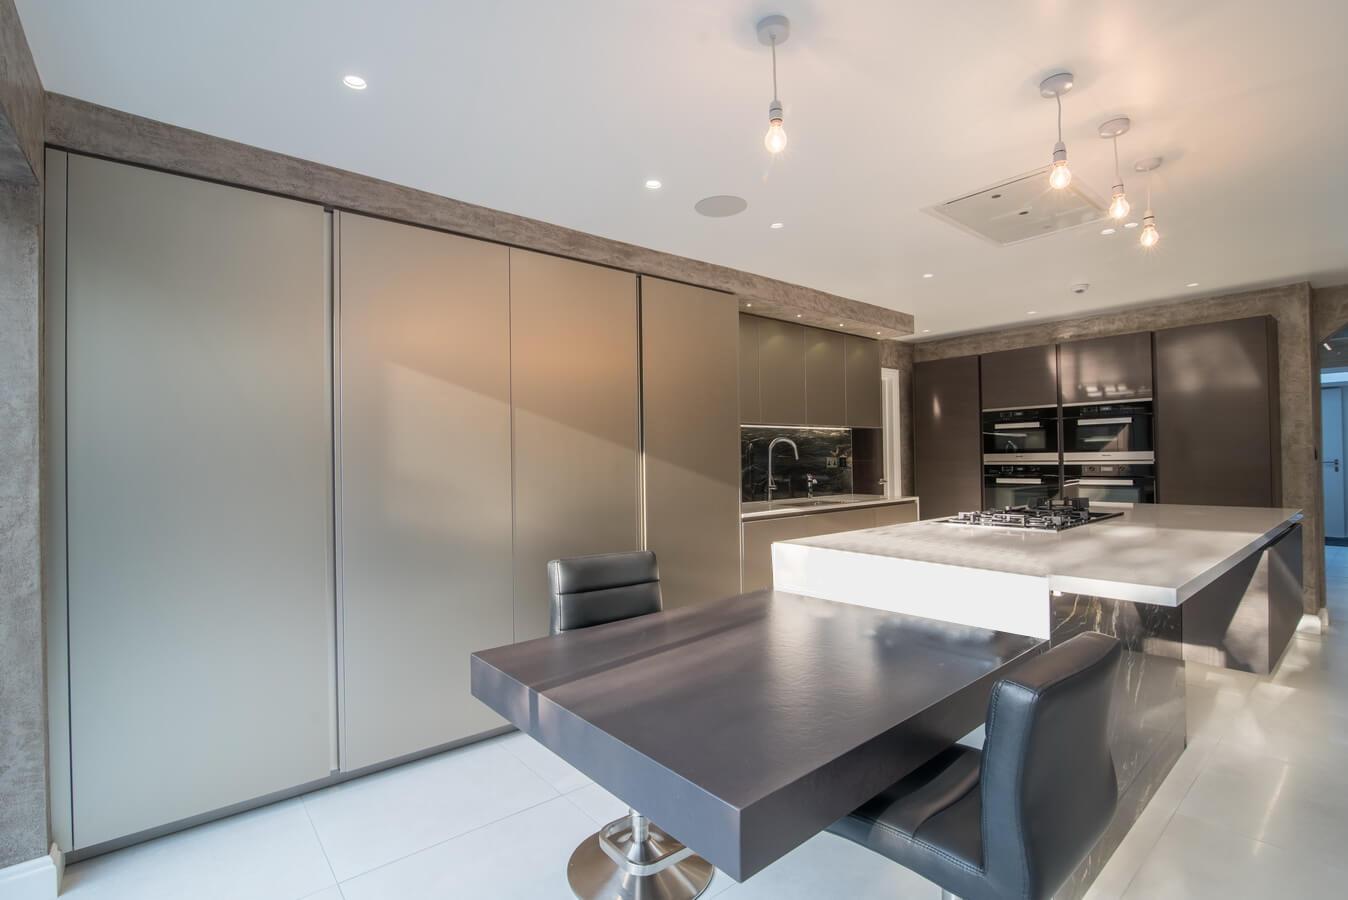 stylish-german-kitchen-by-warendforf-london_2.jpg